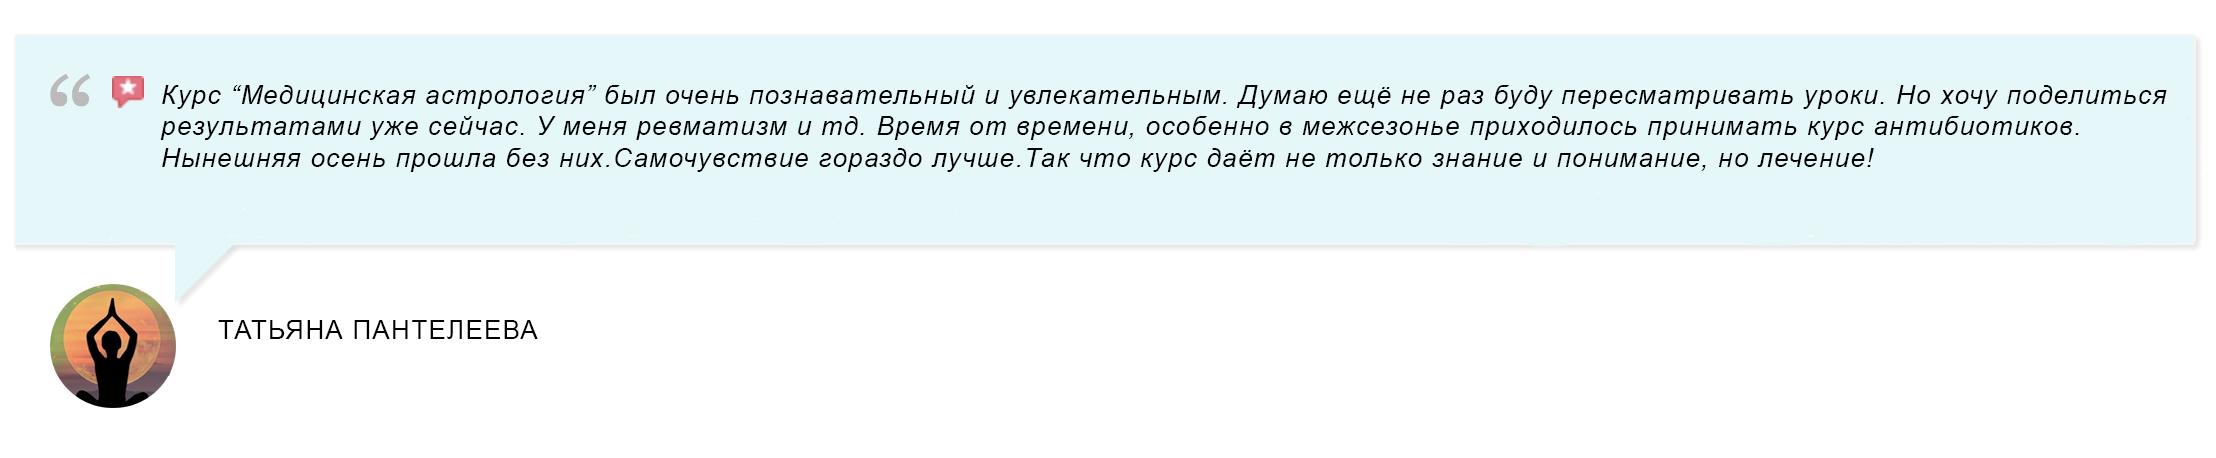 https://astrologtasha.ru/wp-content/uploads/2020/10/tatjanapanteleeva_otzyv.jpg